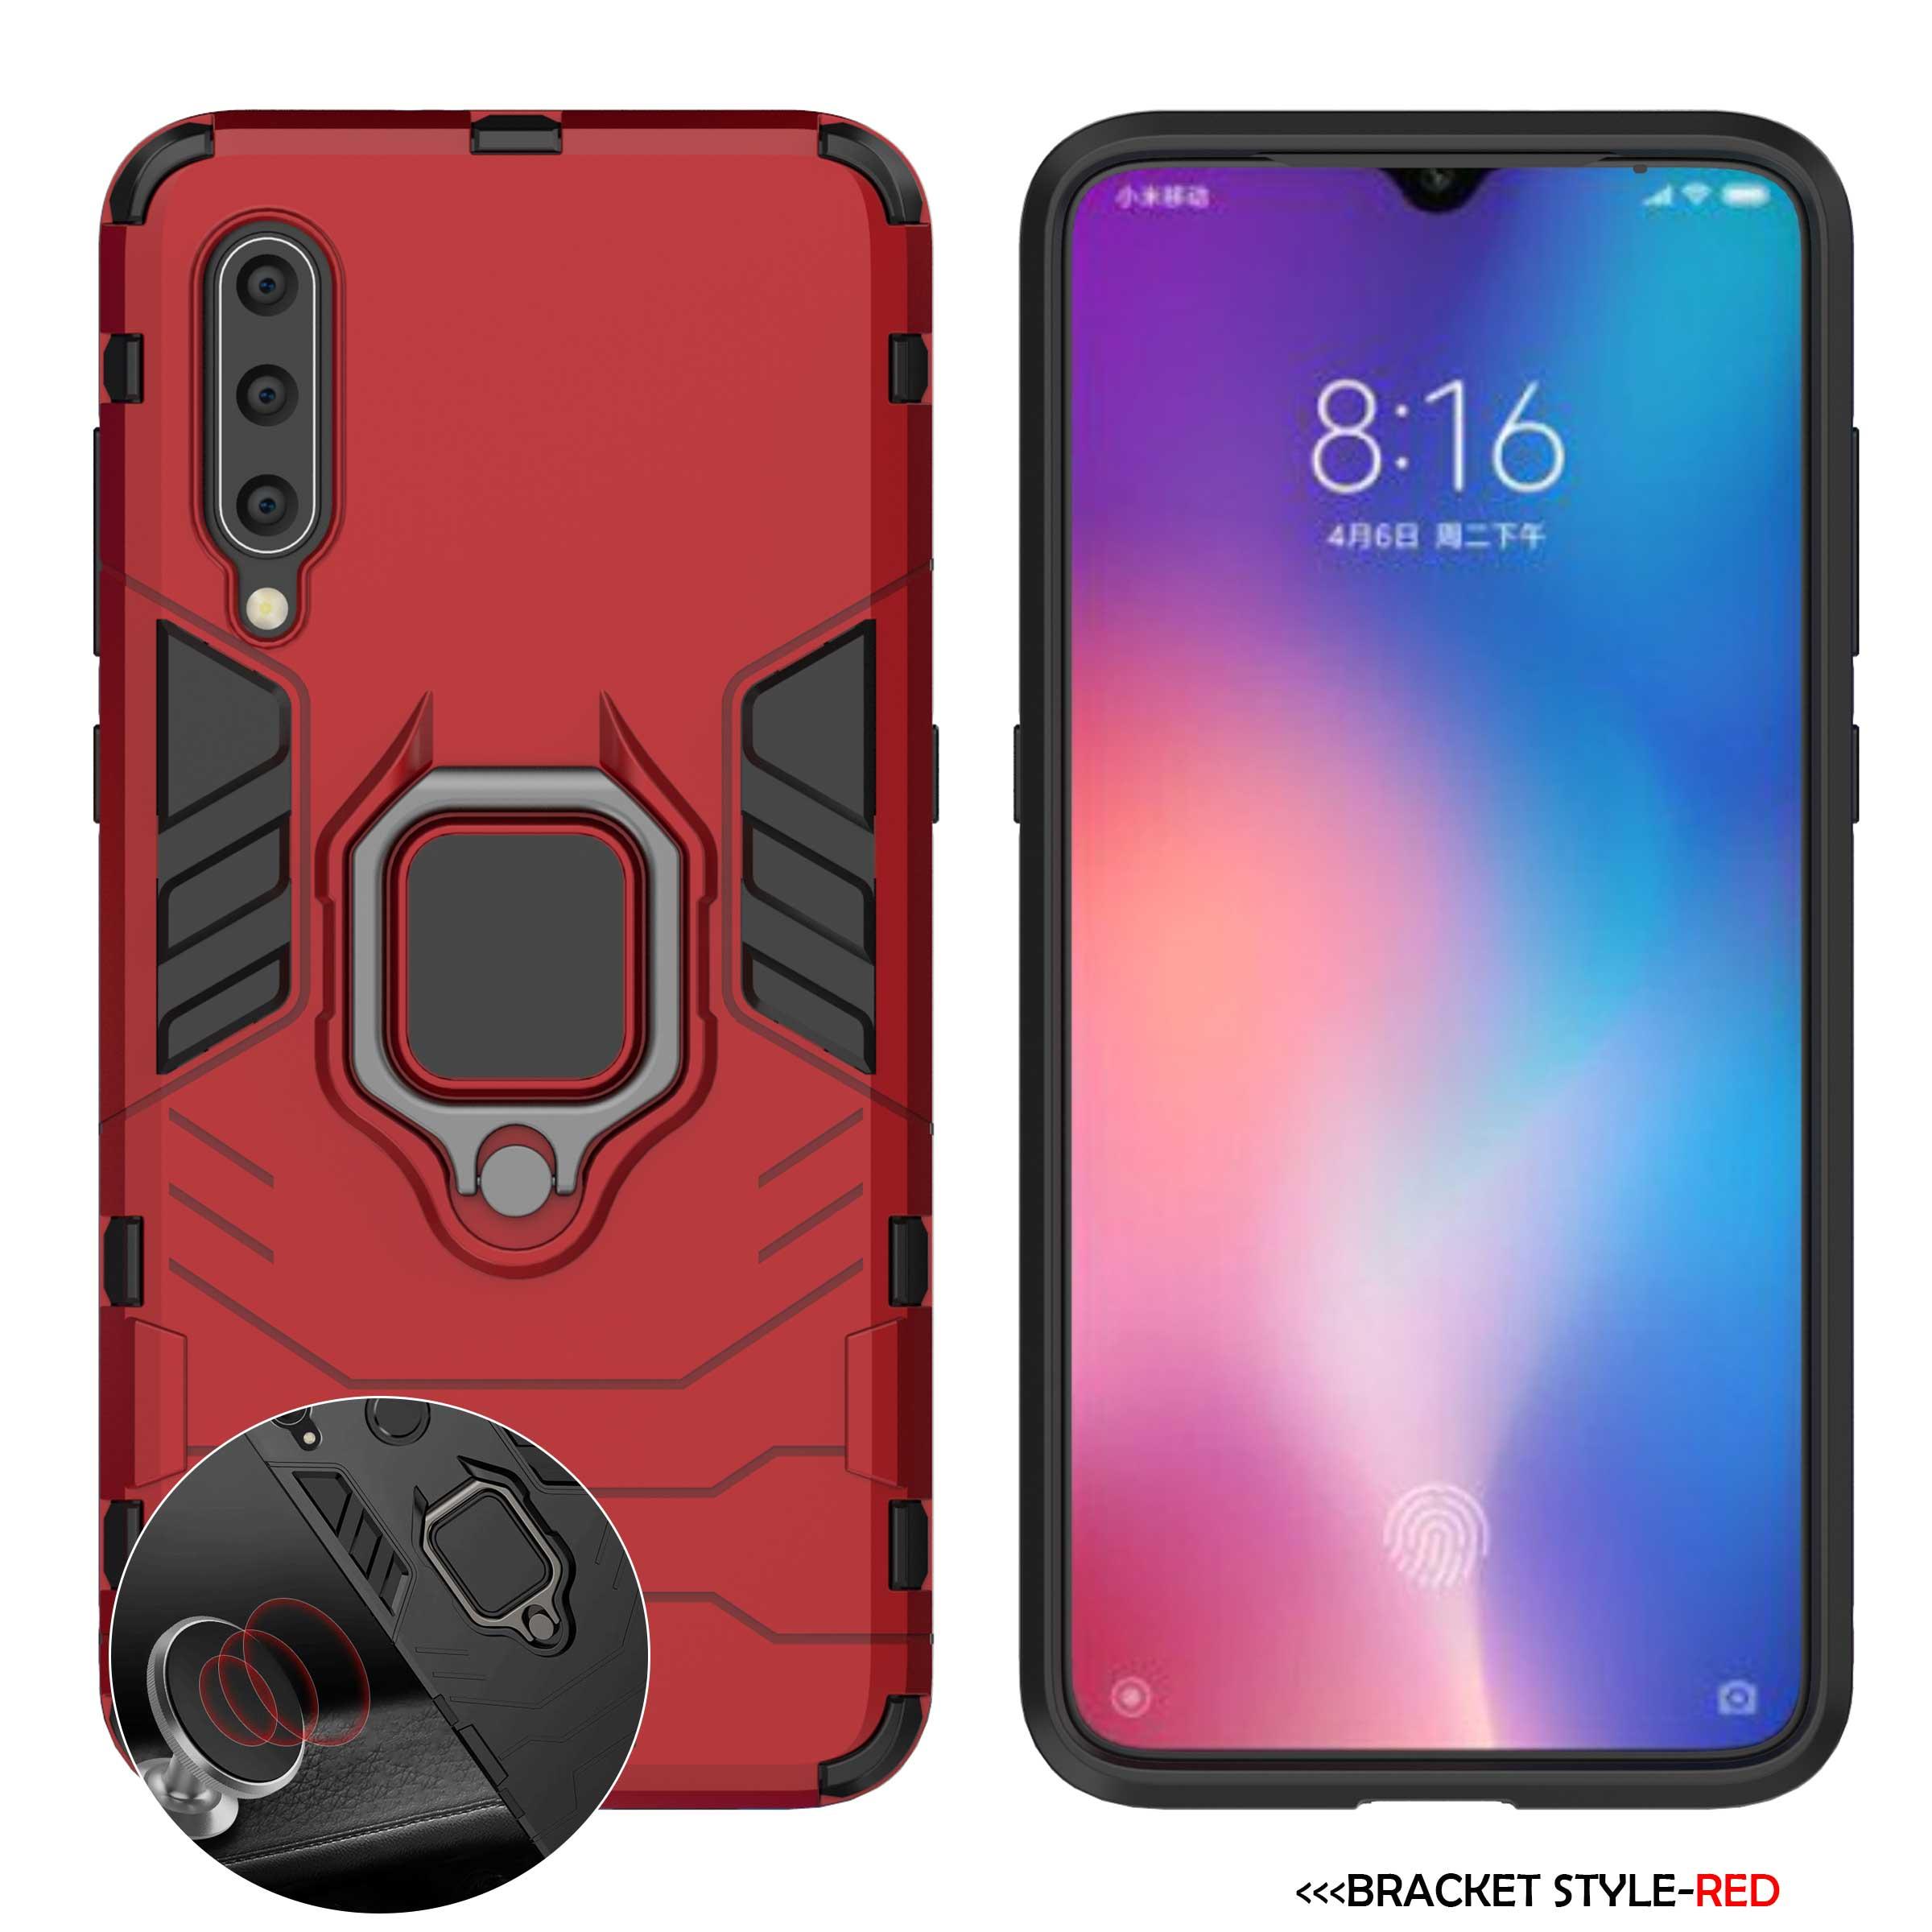 Армированный чехол для Xiaomi mi 9 9T 8 mi 9 SE 5X 6X A1 A2 Lite Max 3 mi X 2 2S F1 Играть Red mi K20 Note 7 6 iPad Pro 7A 4 4X5 Plus чехол для телефона - Цвет: F7-Red